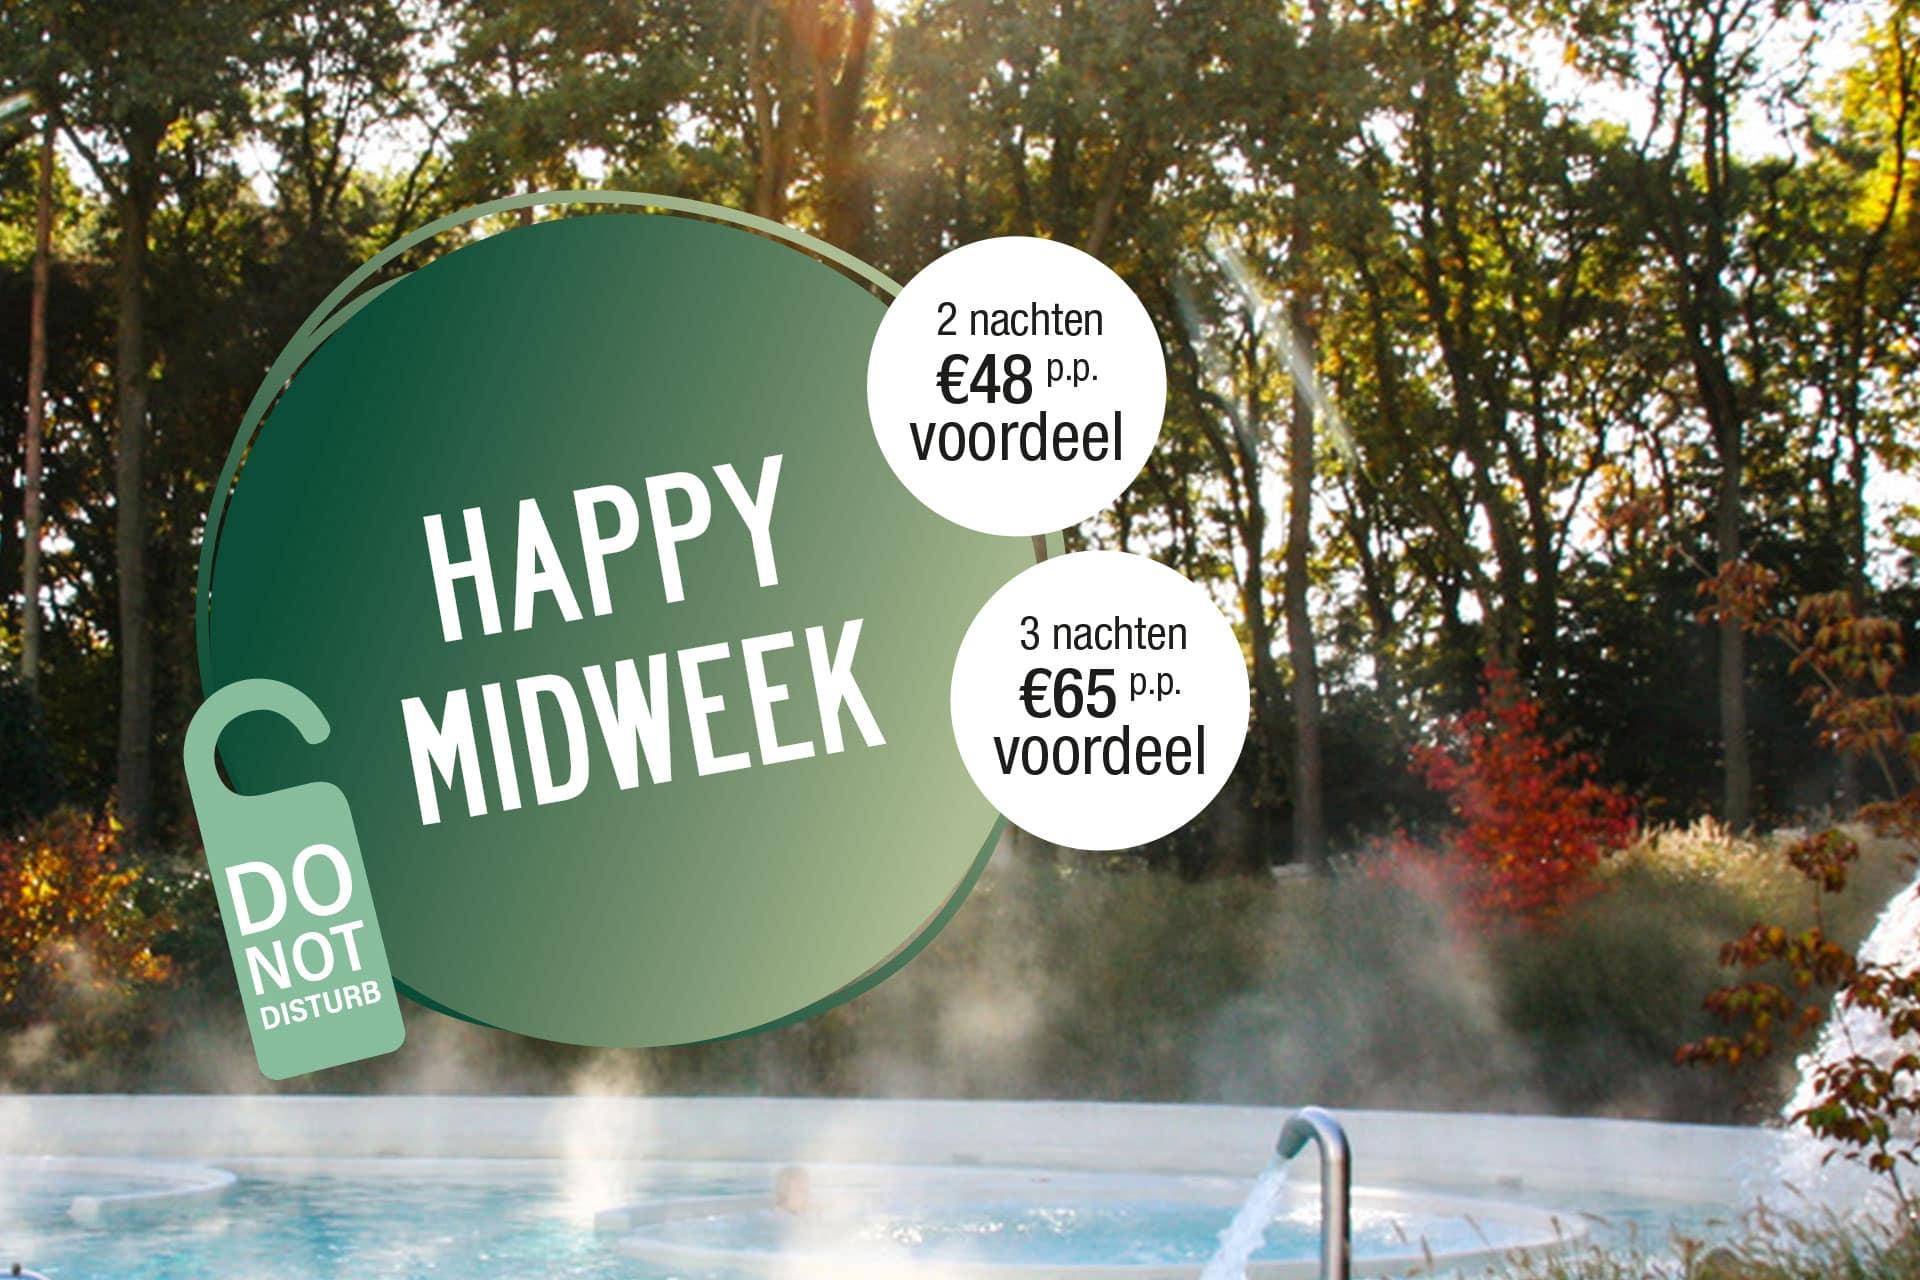 Happy Midweek Hotel mobiel banner